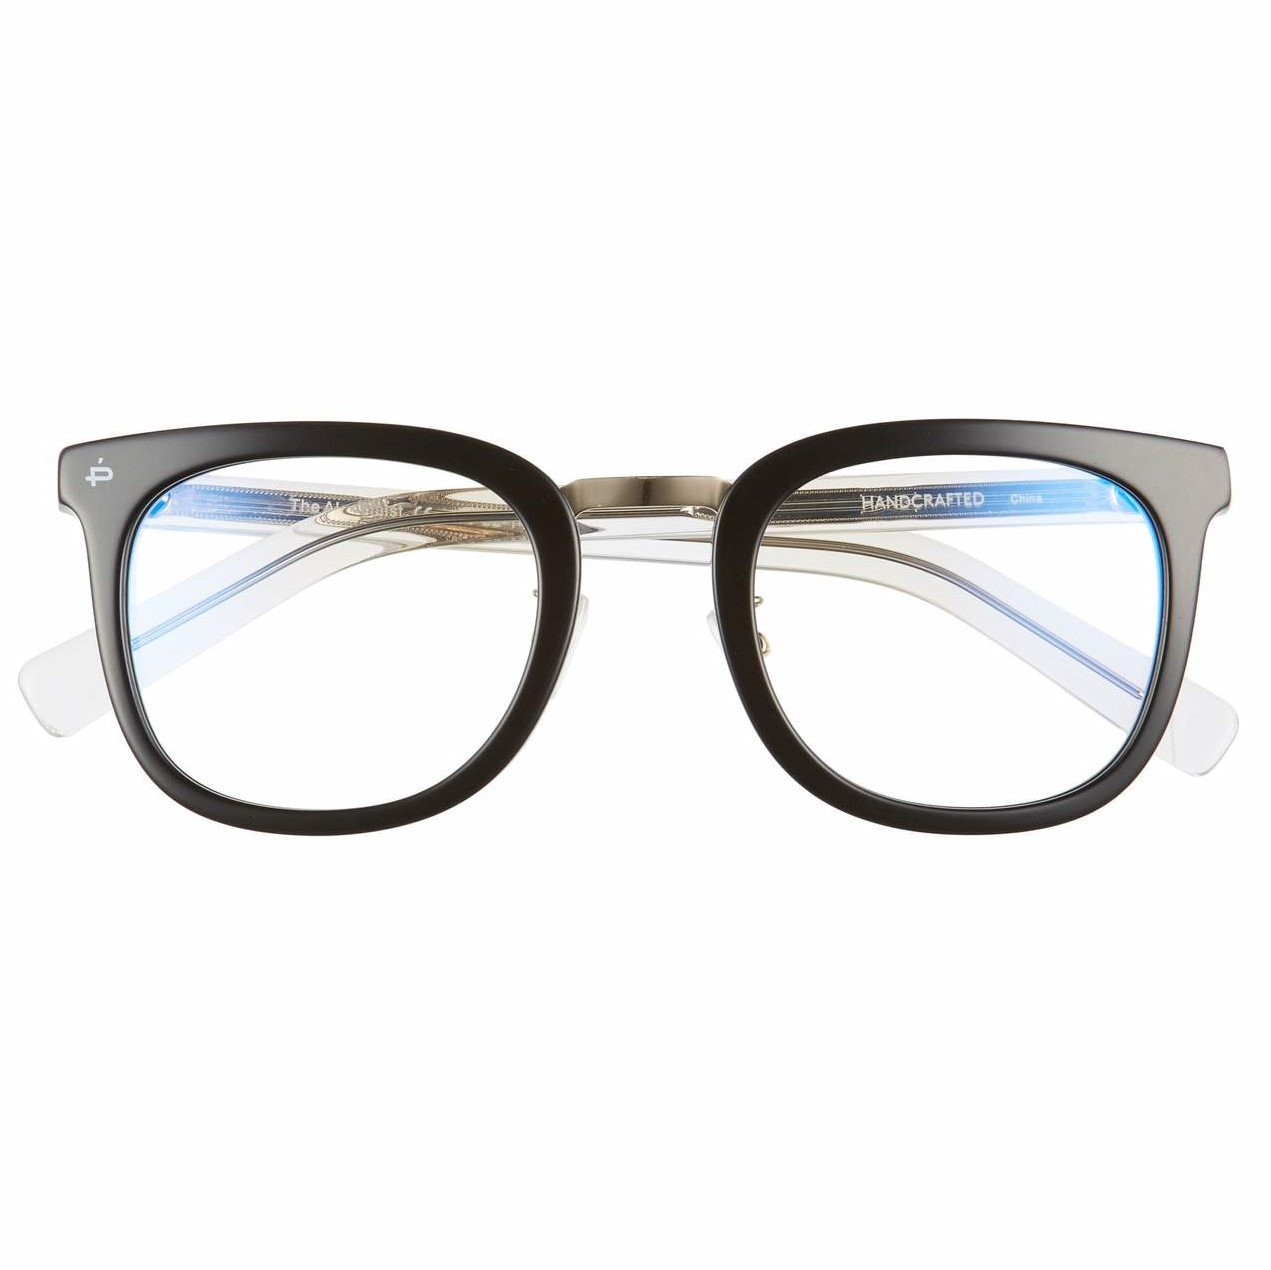 "b3879716a4 PRIVÉ REVAUX ""The Alchemist"" Handcrafted Designer Eyeglasses With Anti  Blue-Light Blocking Lenses (Black)"